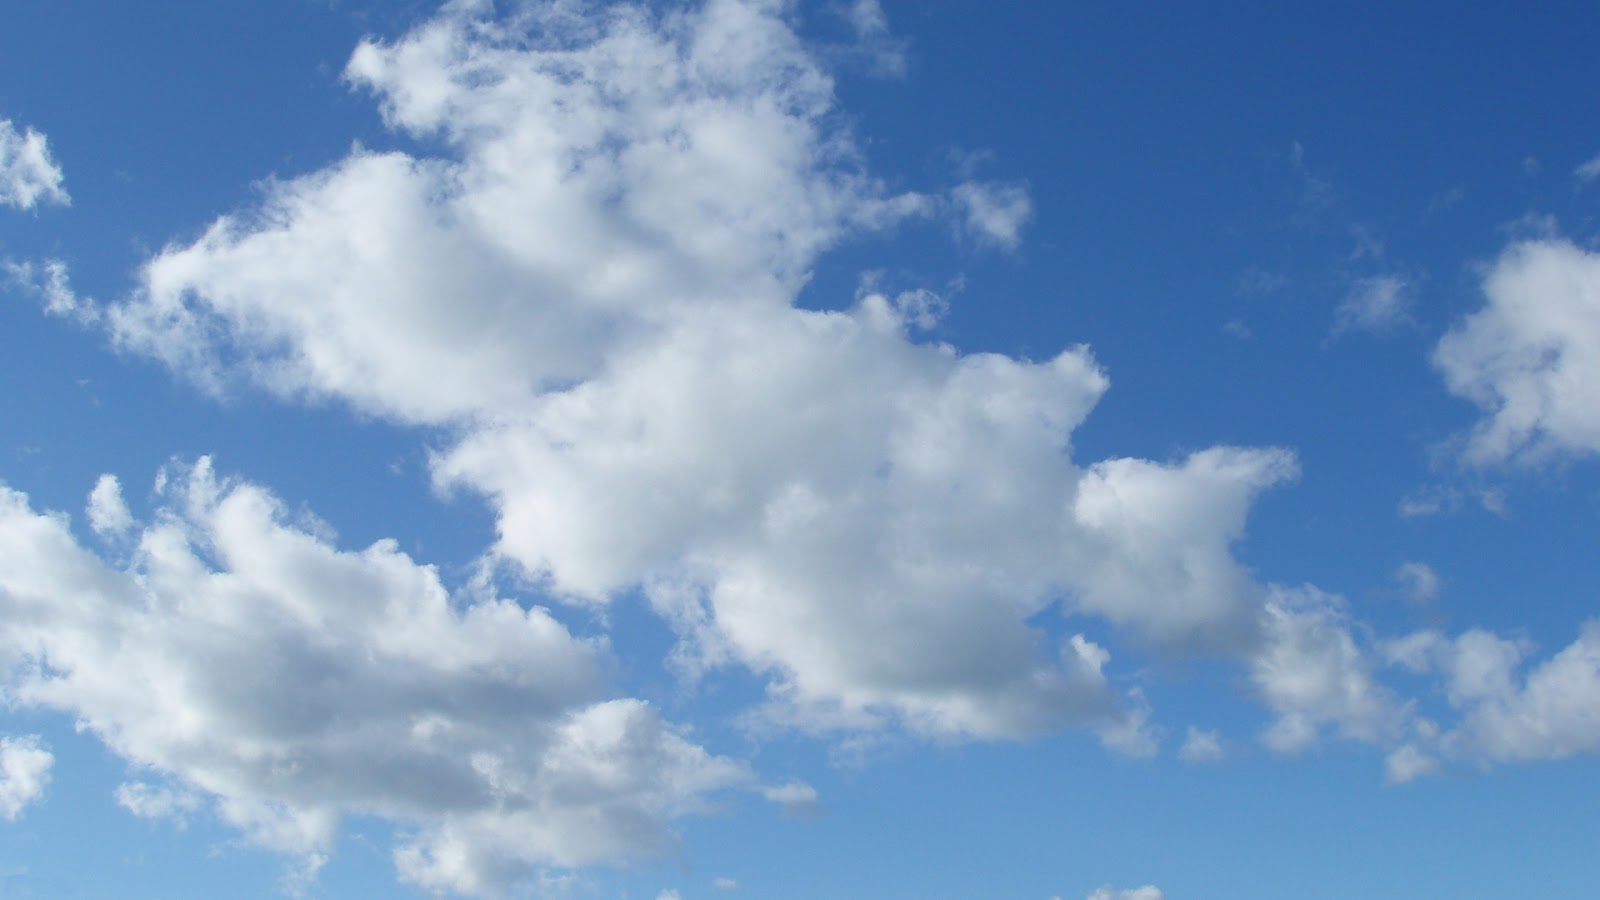 Your Wallpaper: Clouds Wallpaper